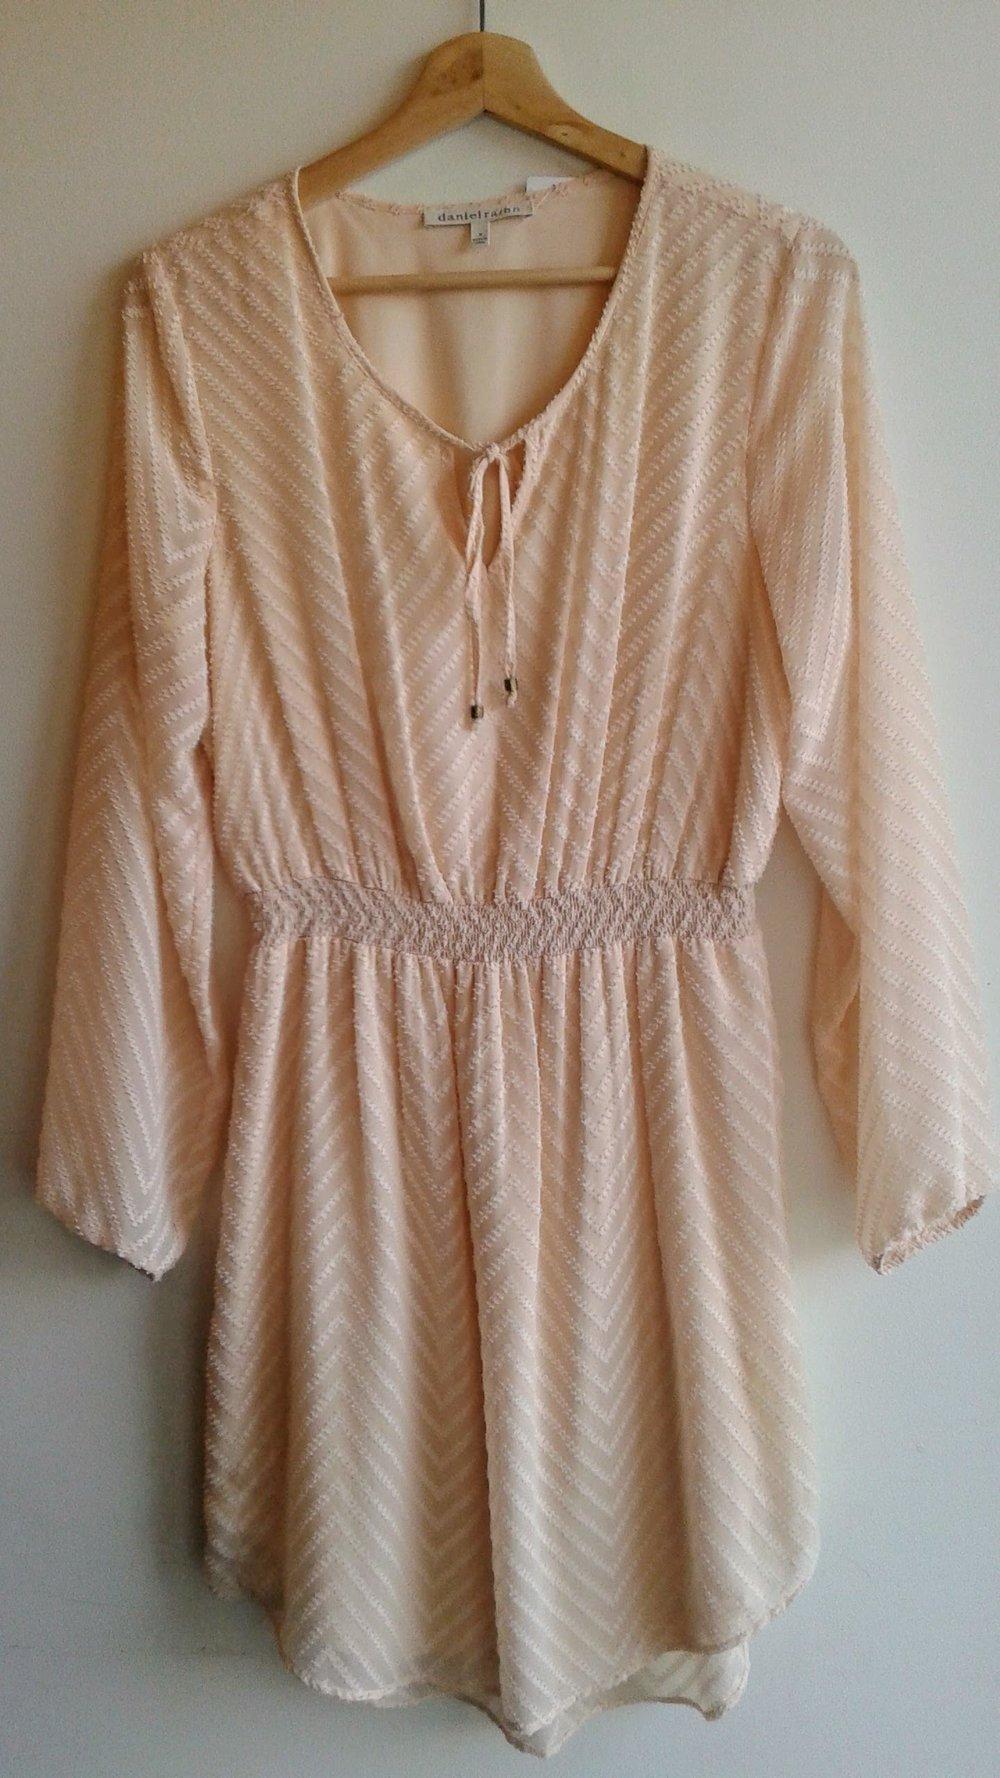 Daniel Rainn  dress; Size M, $30